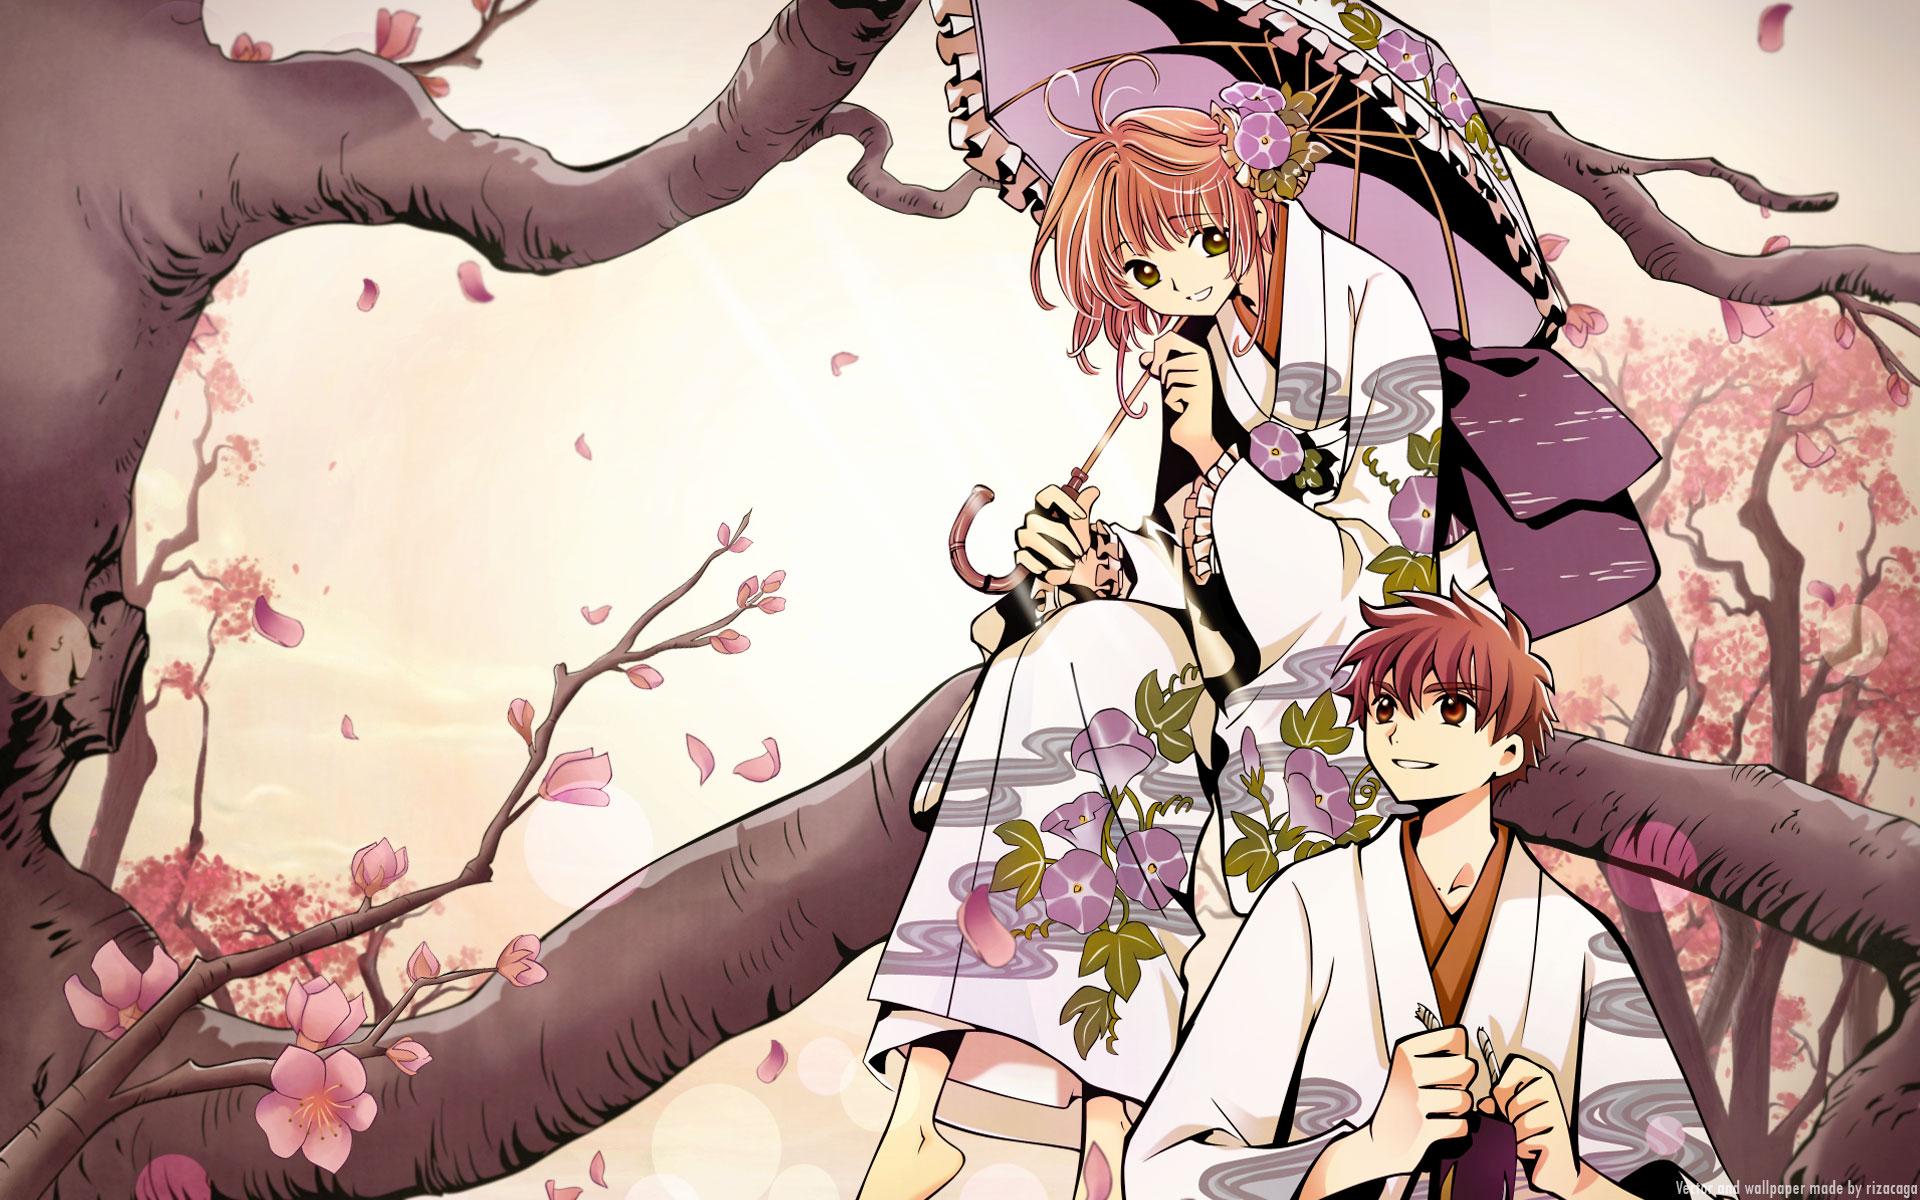 How Tsubasa Reservoir Chronicle Gave Cardcaptor Sakura an Alternate Future